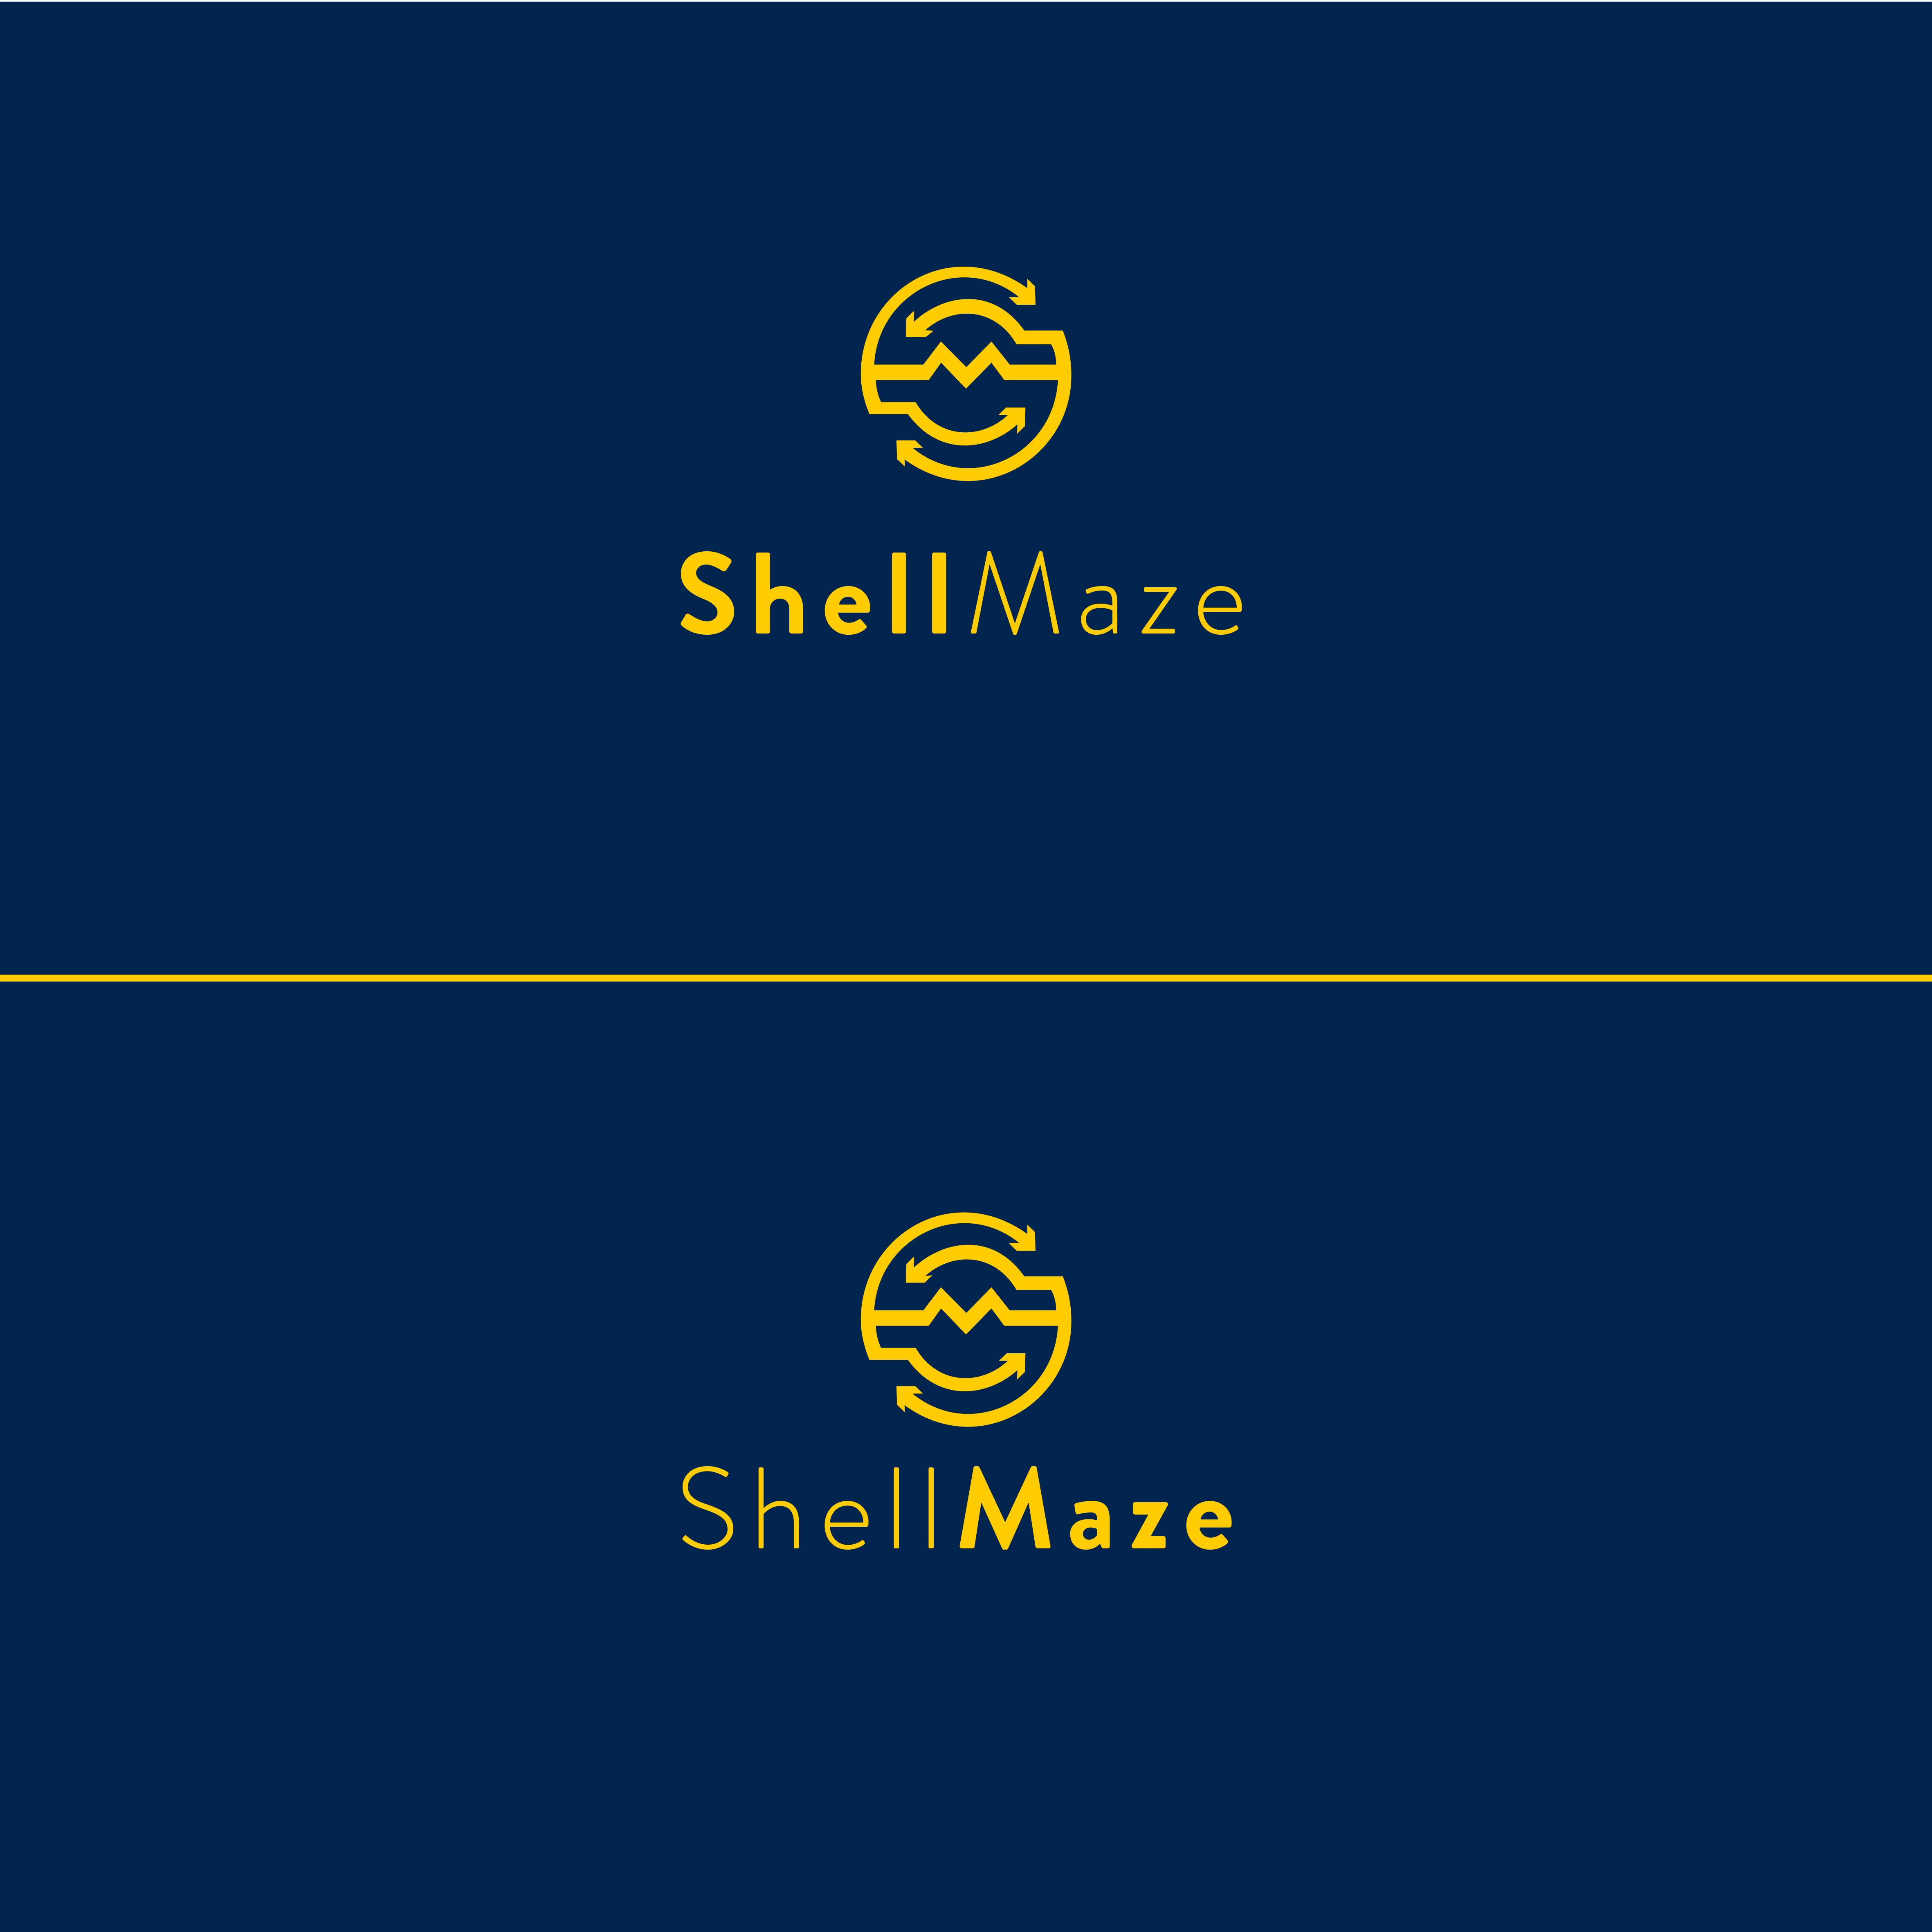 Participating Entry #18 for Logo Design contest - Security Logo Design required by ShellMaze - original